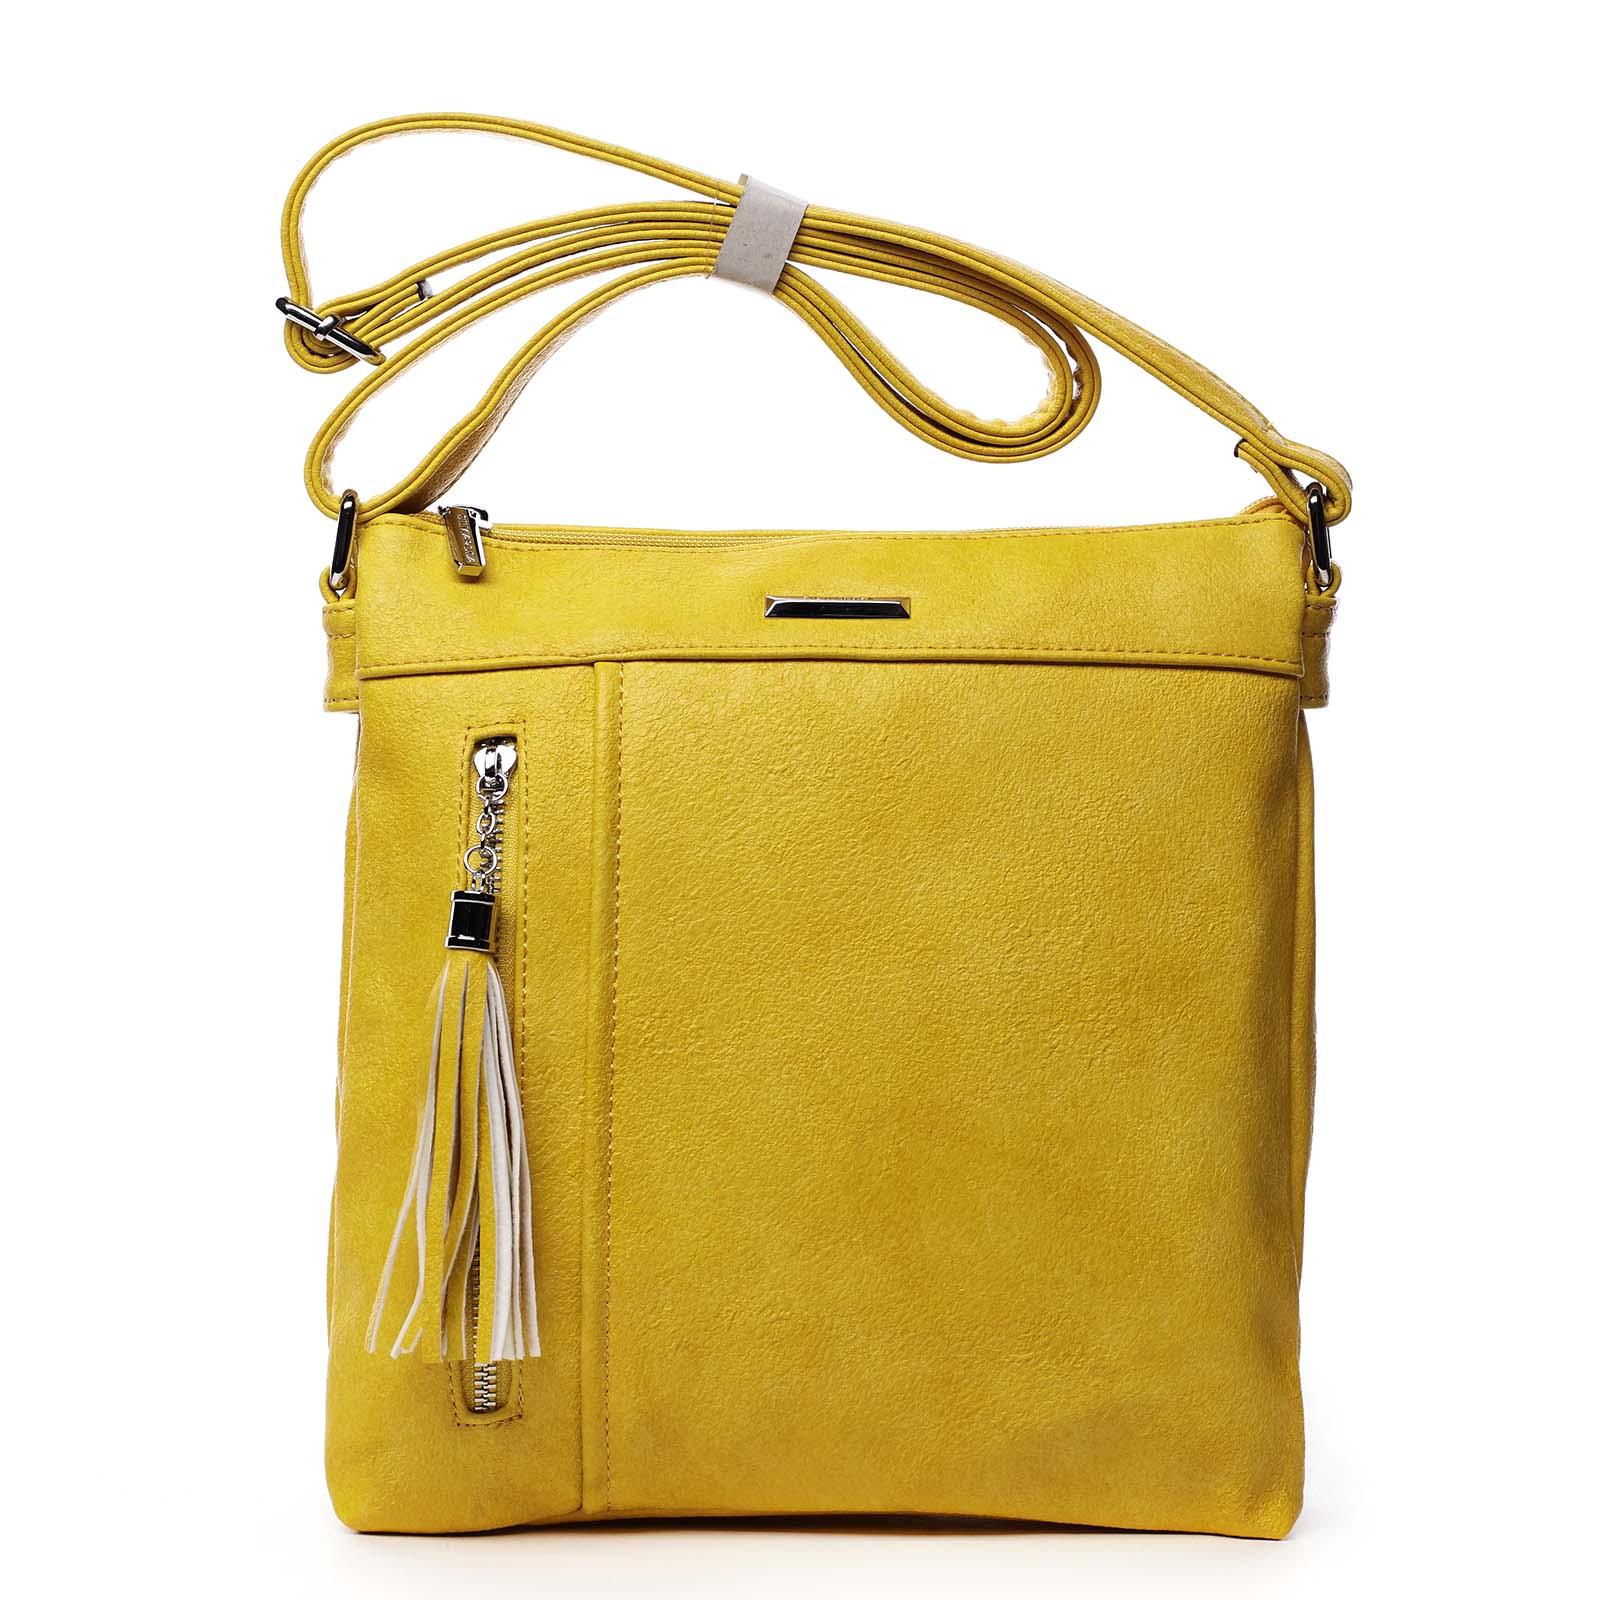 Dámská crossbody kabelky žlutá - Silvia Rosa Isitha žlutá